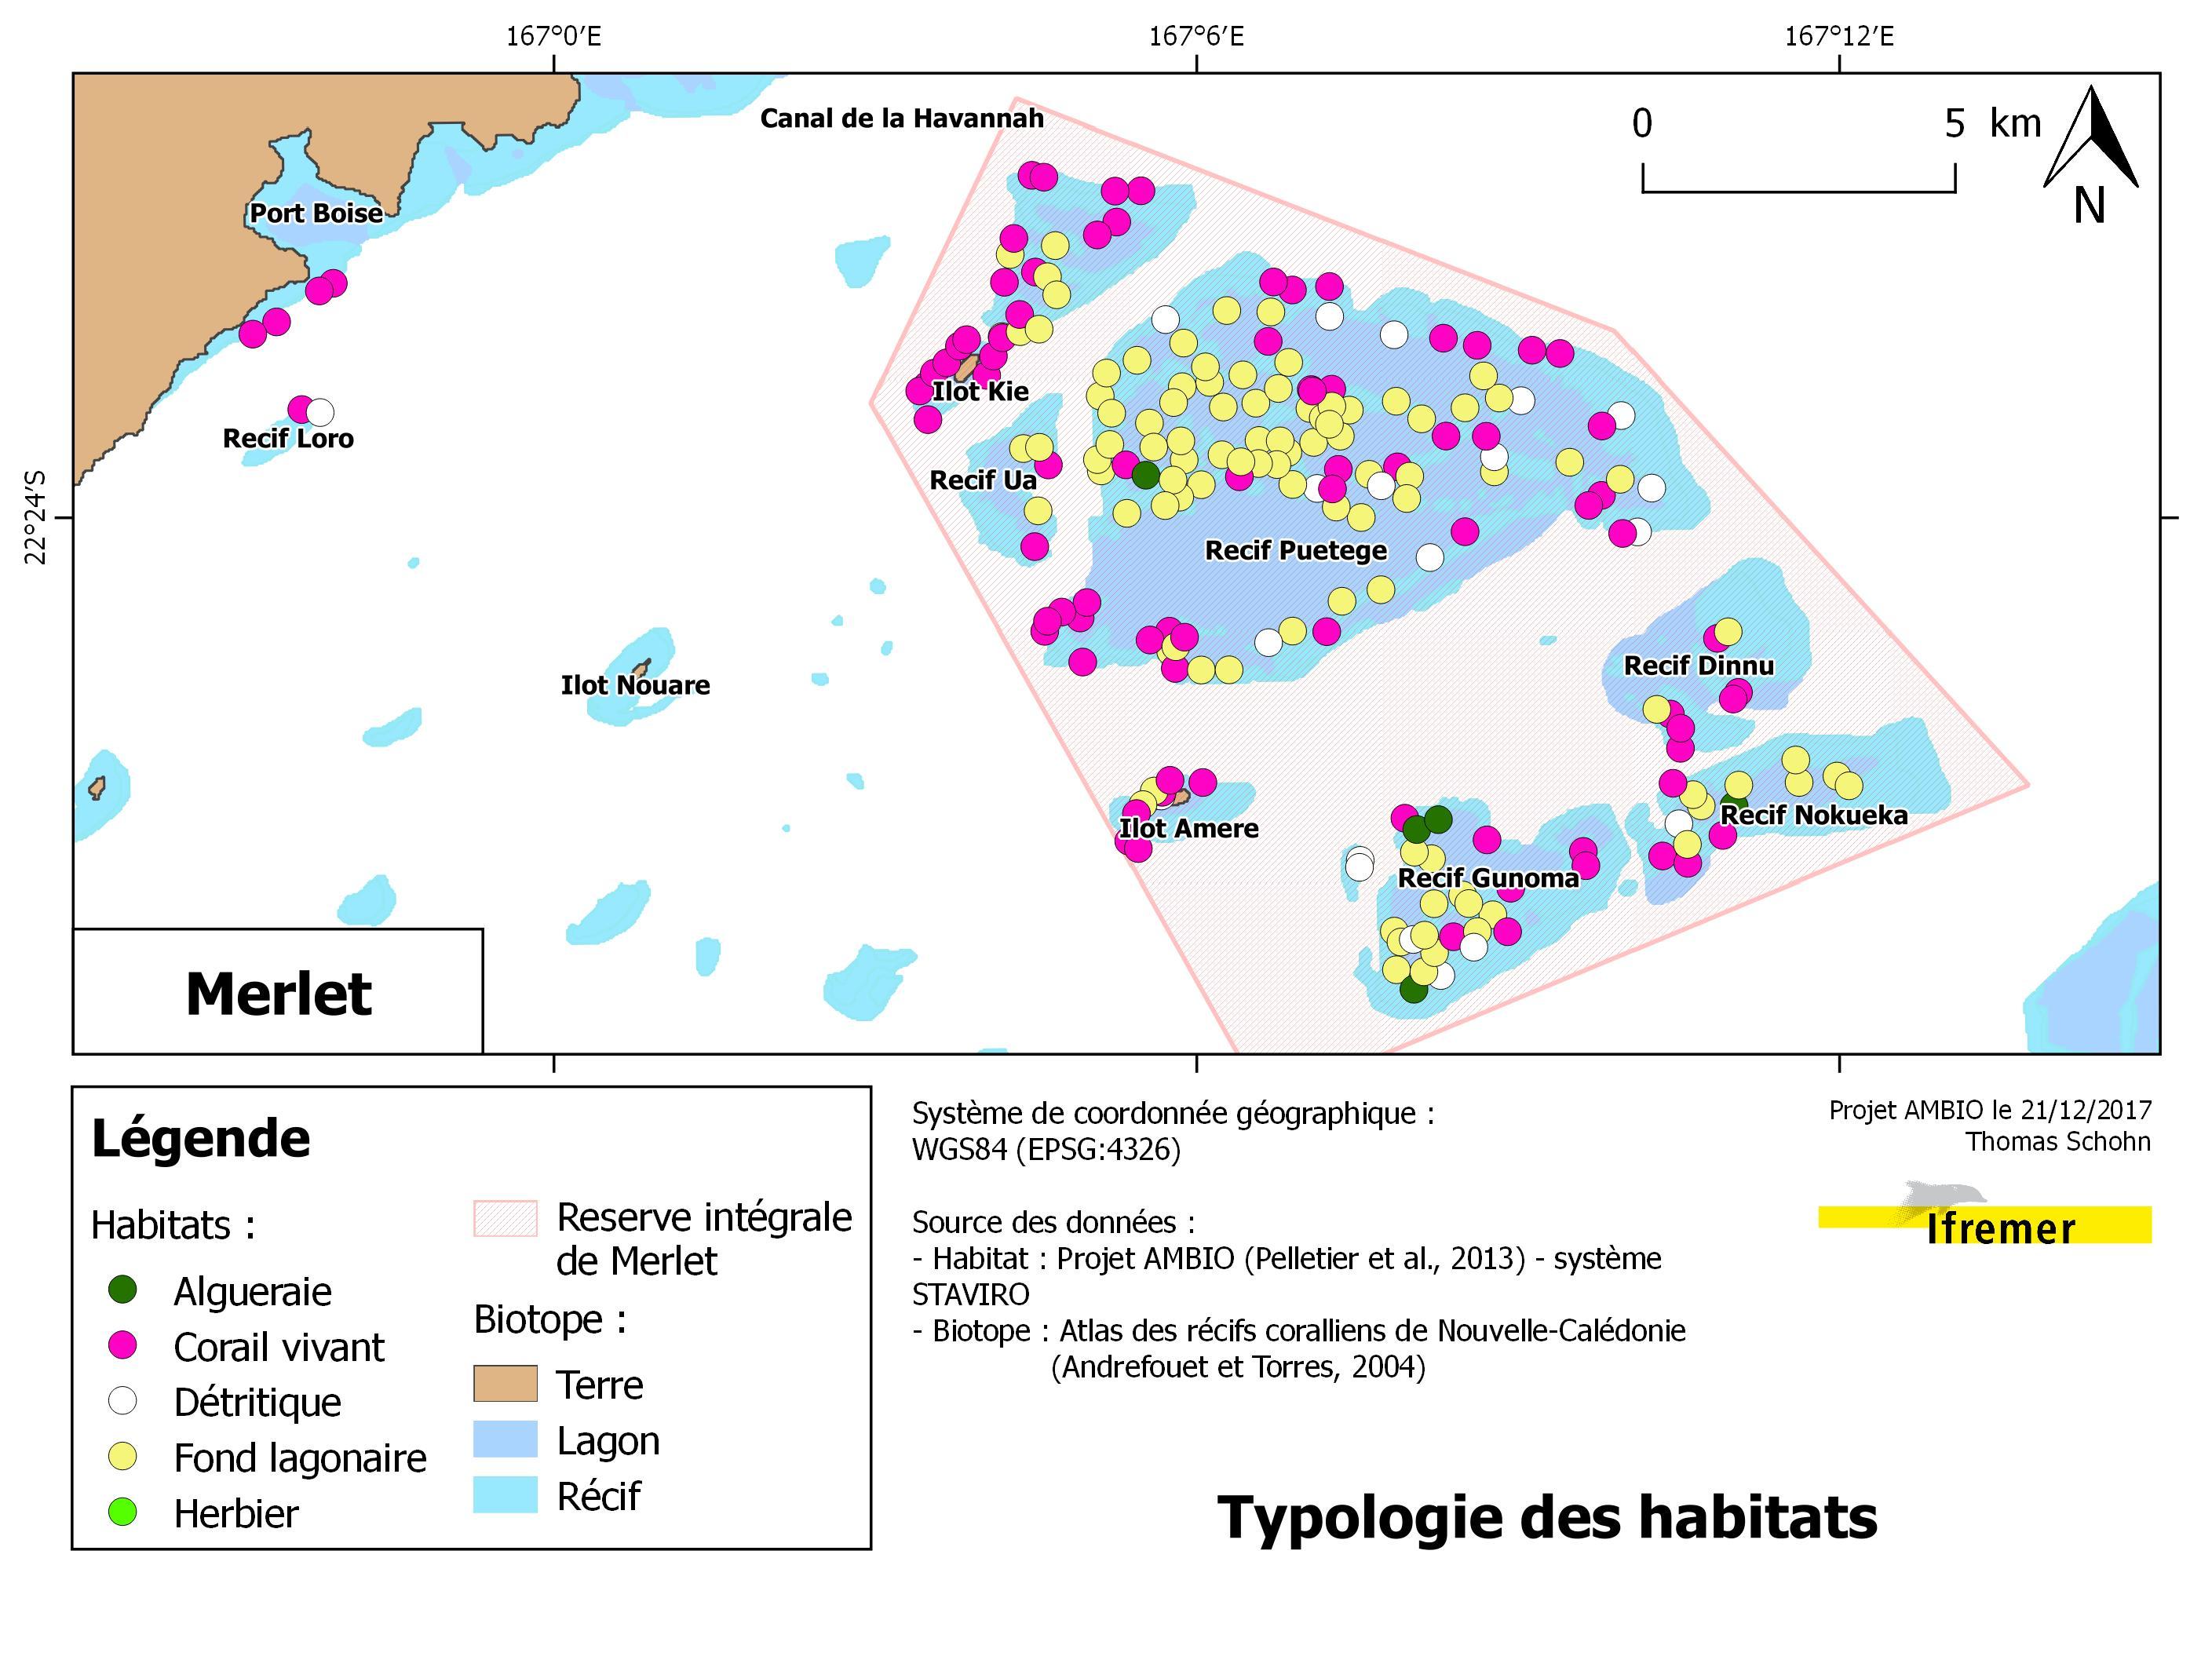 Typologie des habitats - Merlet 2013.jpg